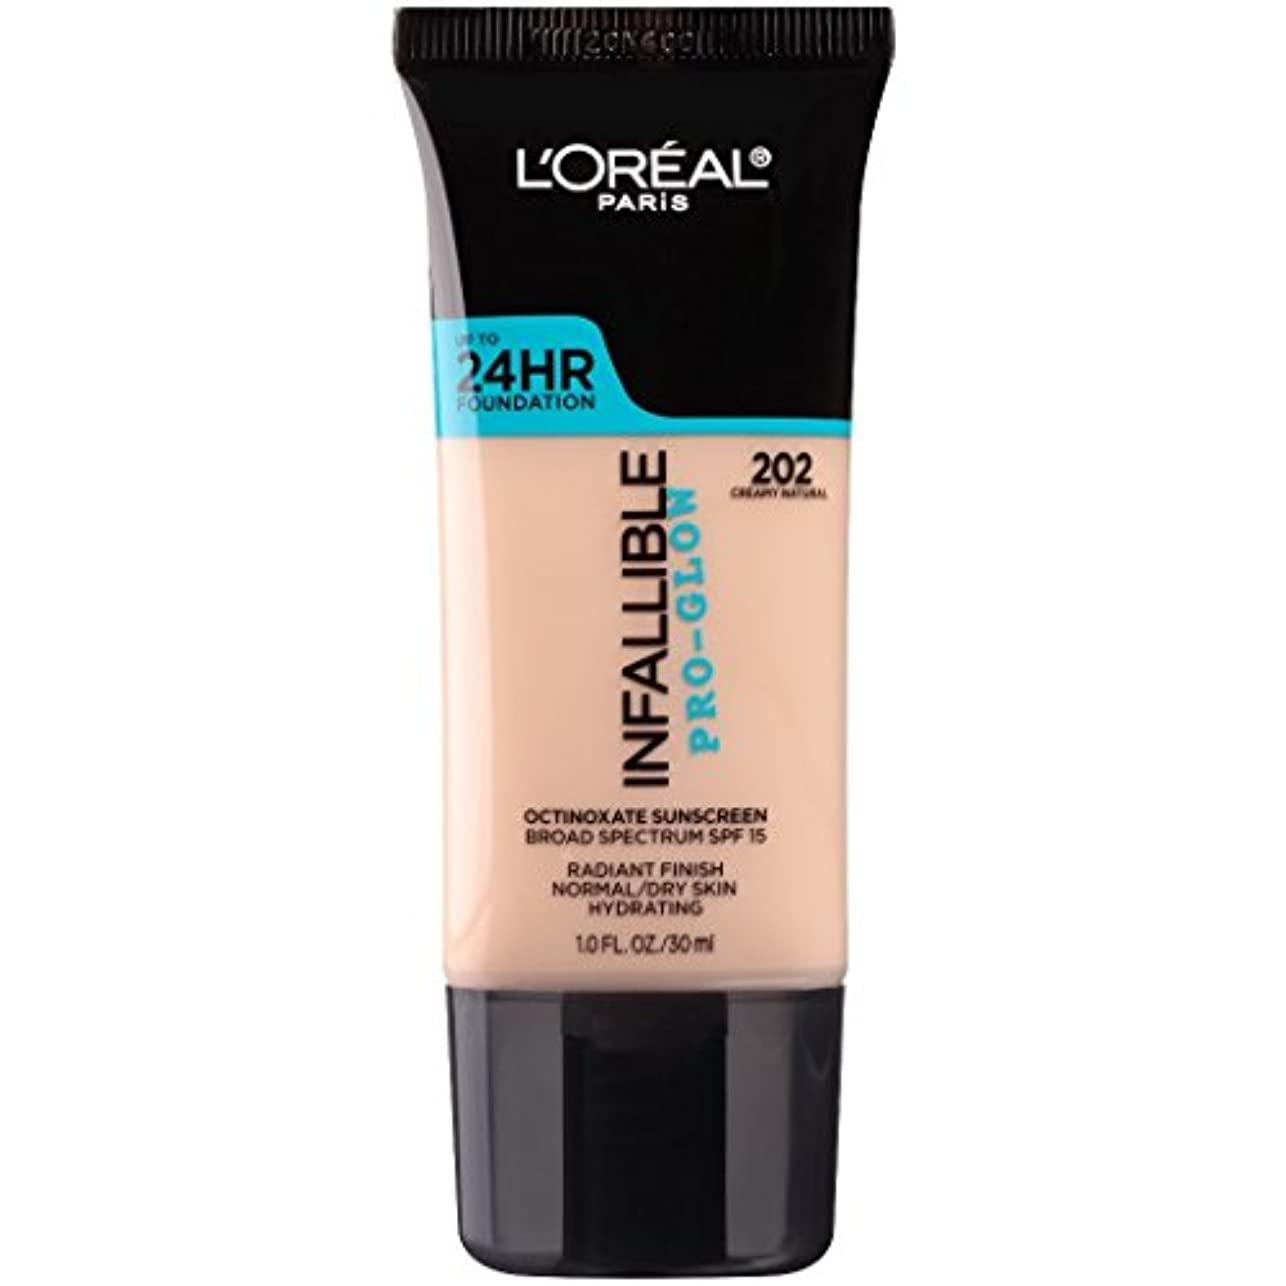 L'OREAL Infallible Pro-Glow Foundation - Creamy Natural (並行輸入品)